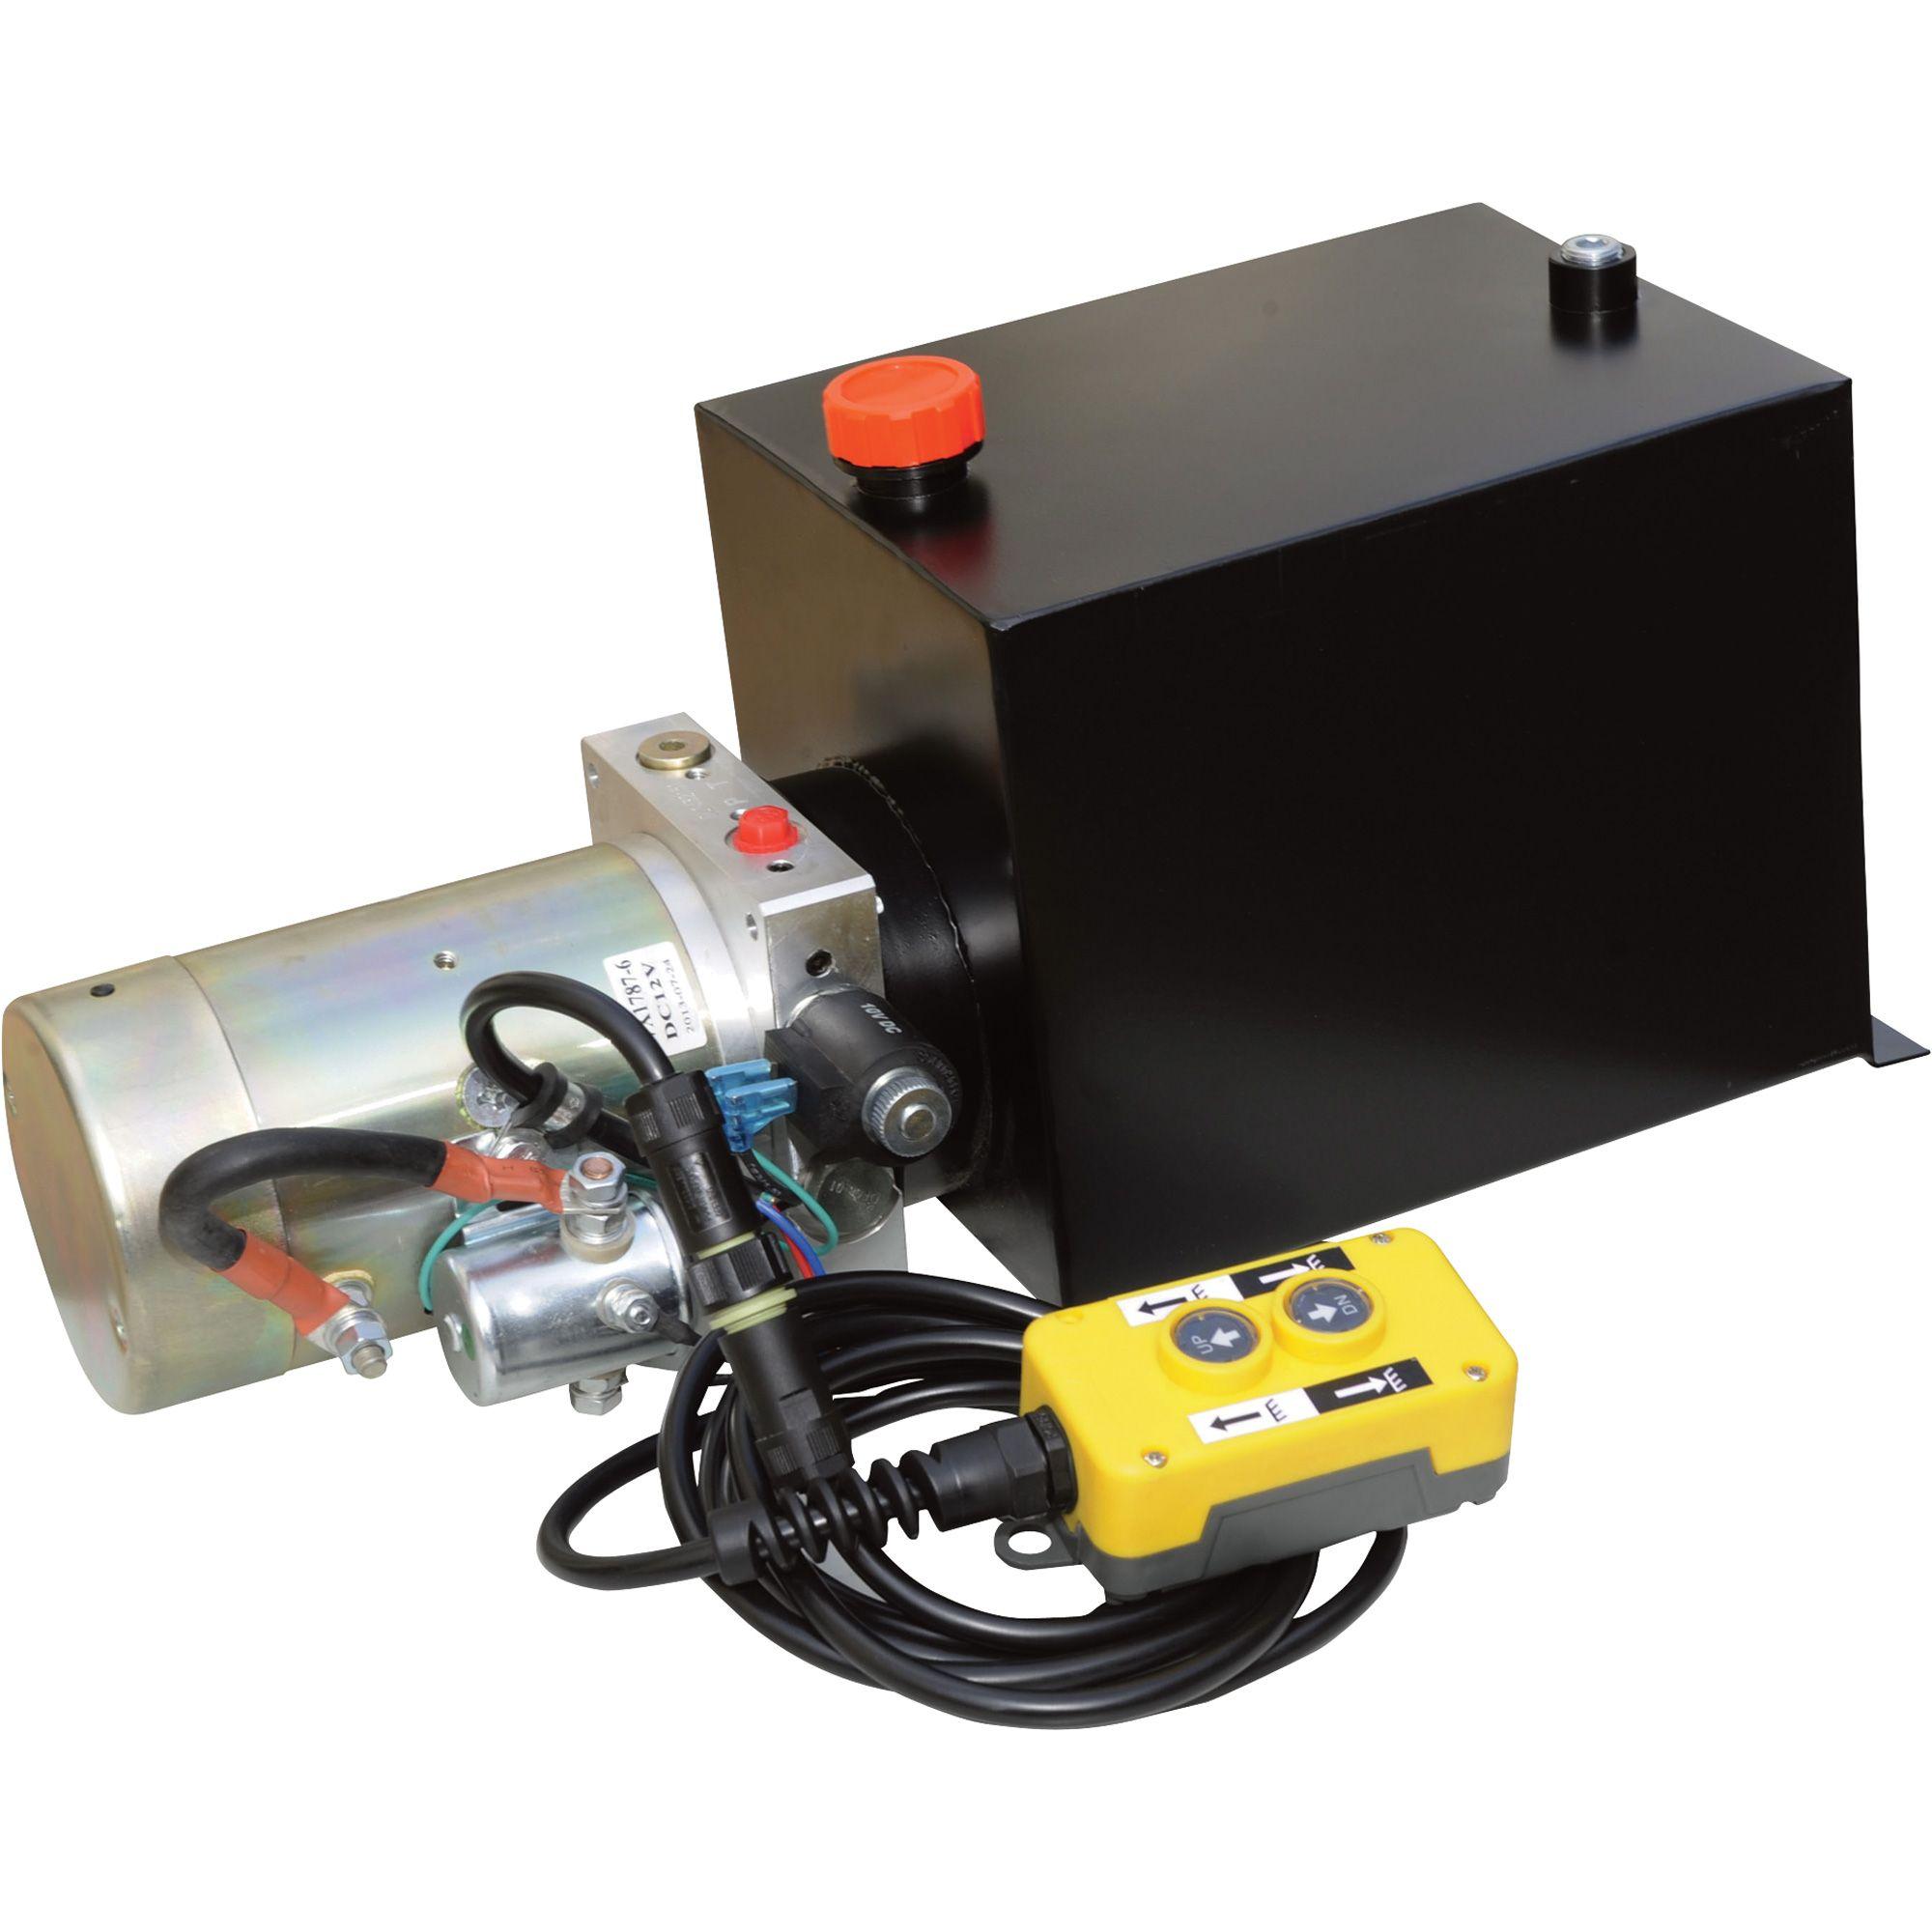 12 Volt Hydraulic Pump Wiring Diagram 2002 Toyota Camry Parts Nortrac Dc Power Unit Single Acting Dump Trailer